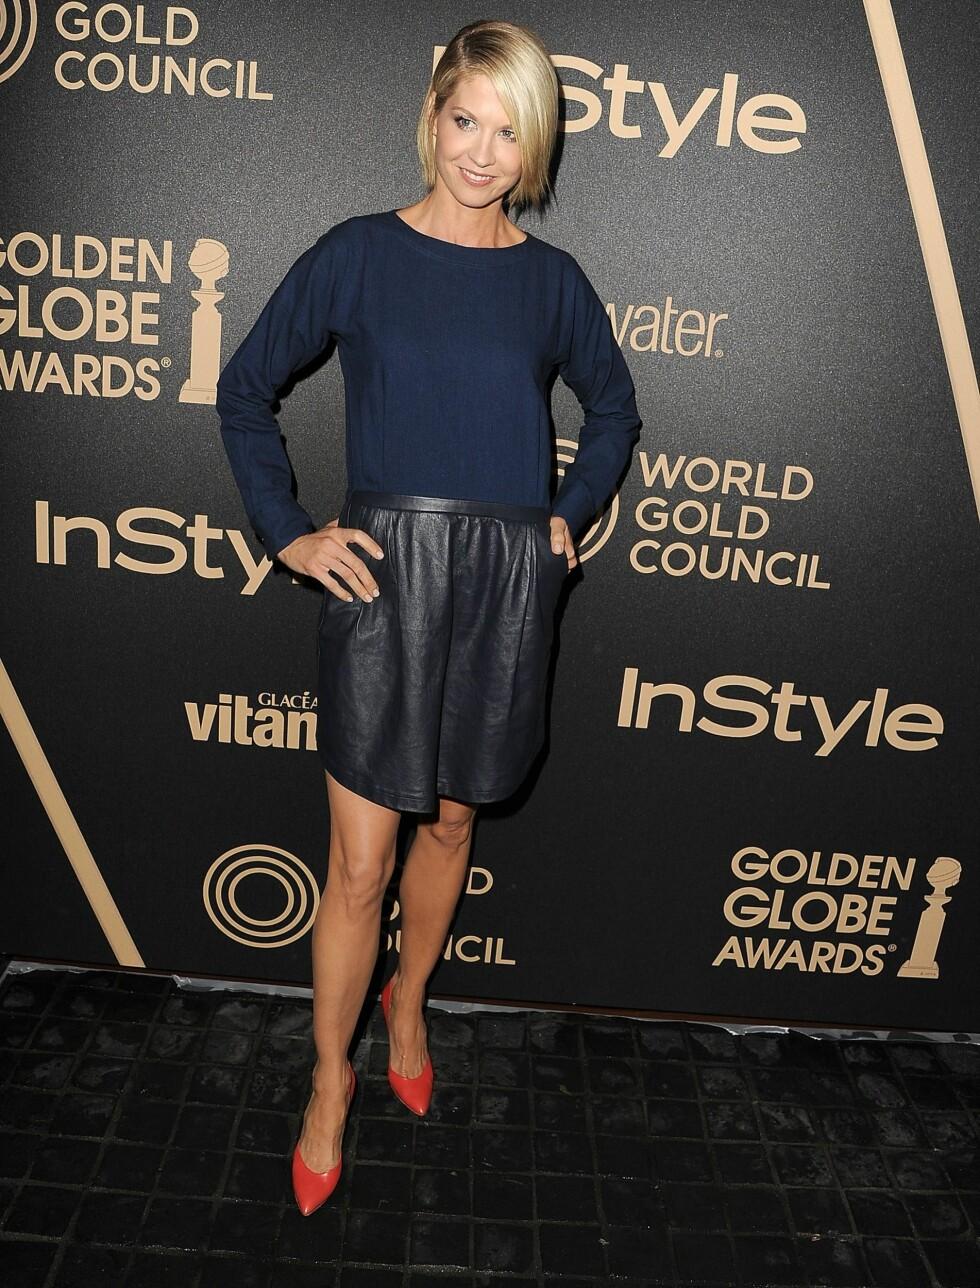 Jenna Elfman Foto: All Over Press